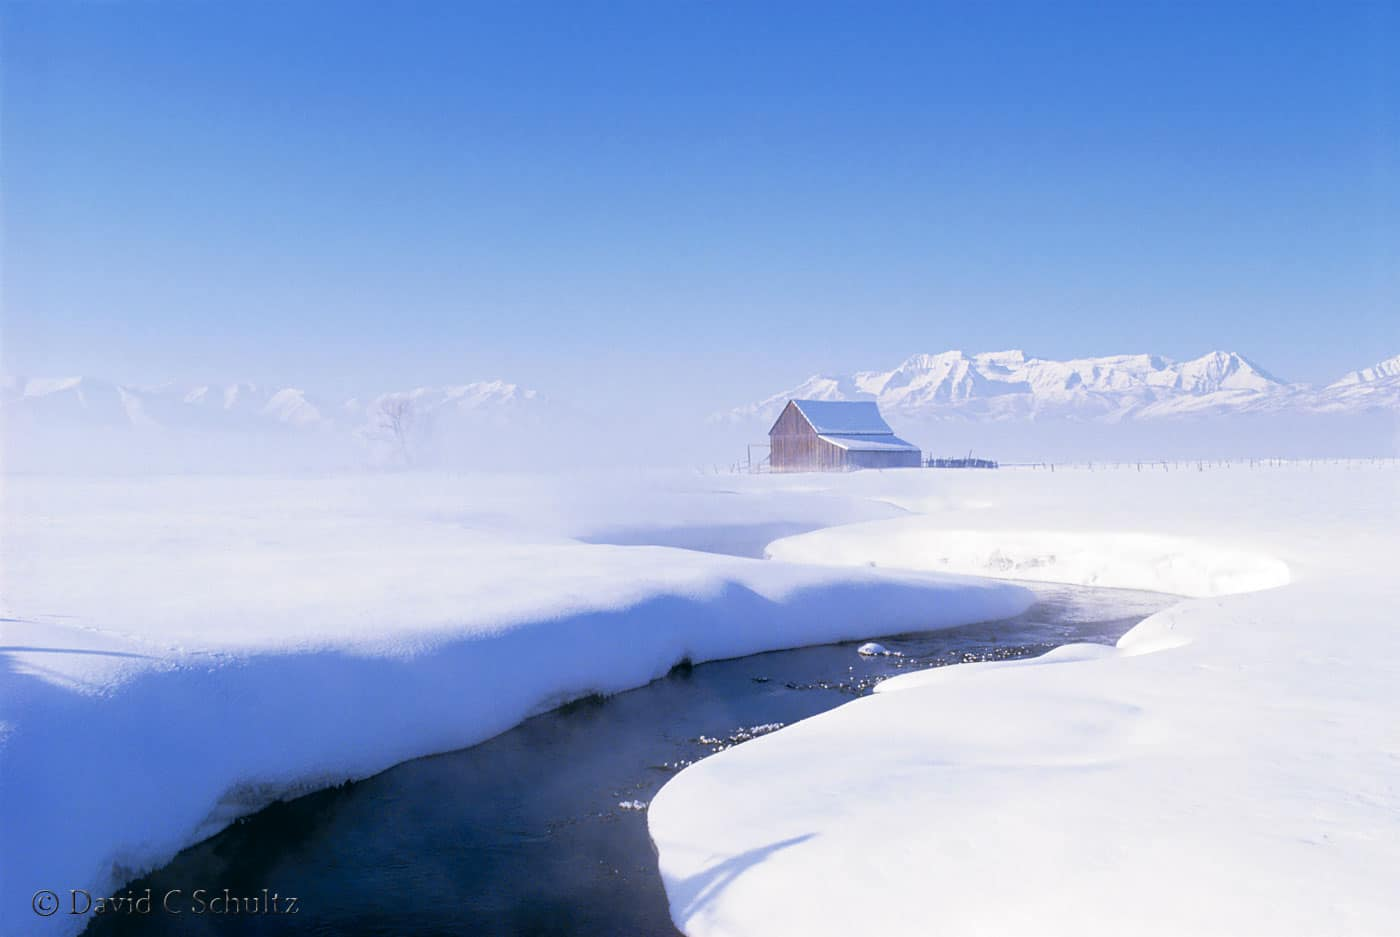 Winter, The North Fields, Heber Valley, UT - Image #102-57